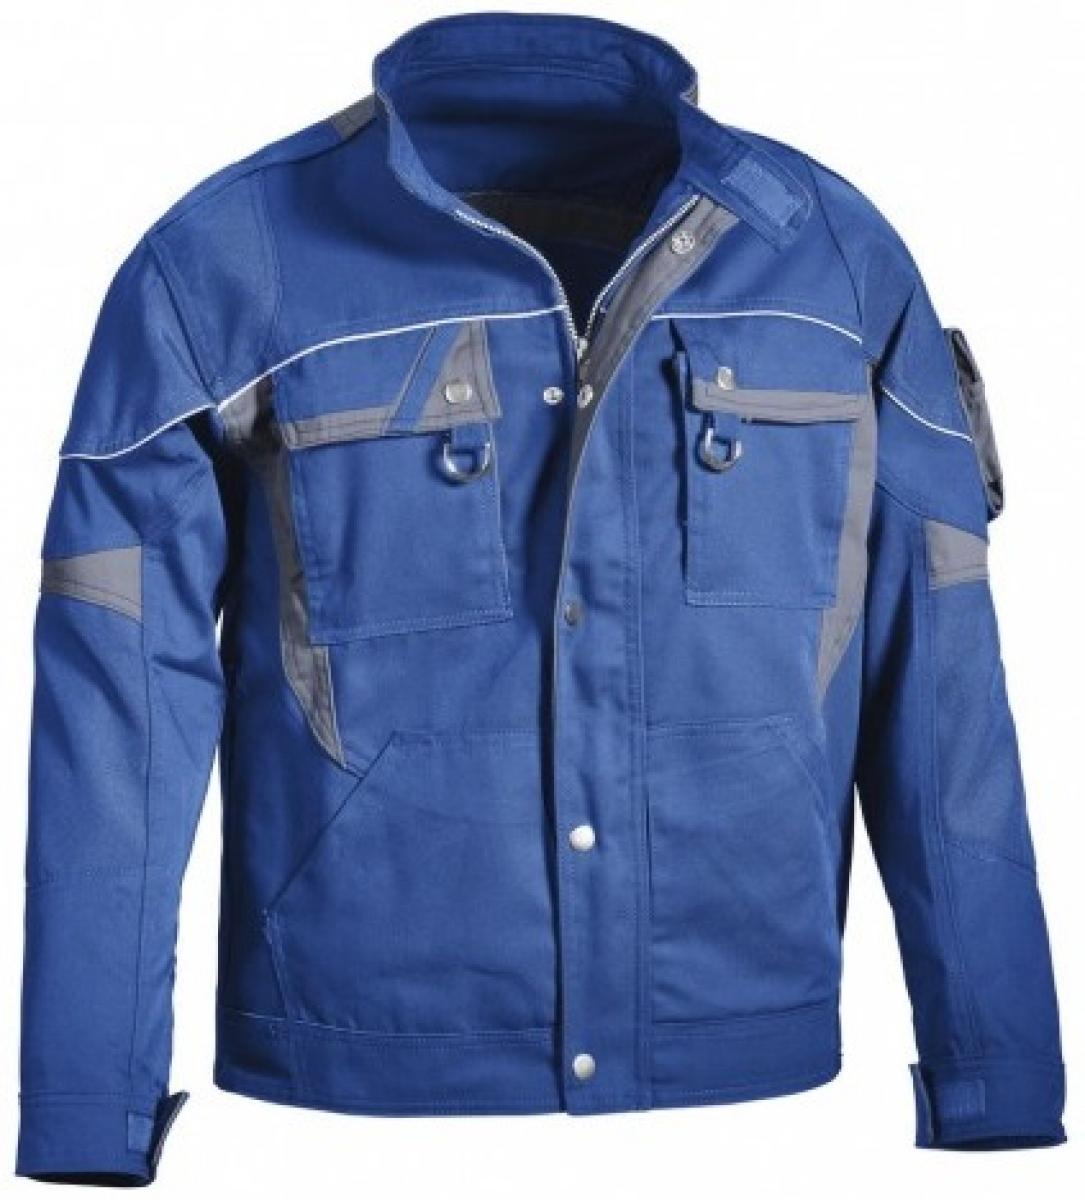 PKA-Arbeits-Berufs-Bund-Jacke, Blouson, Threeline De Luxe, MG330, kornblau/grau